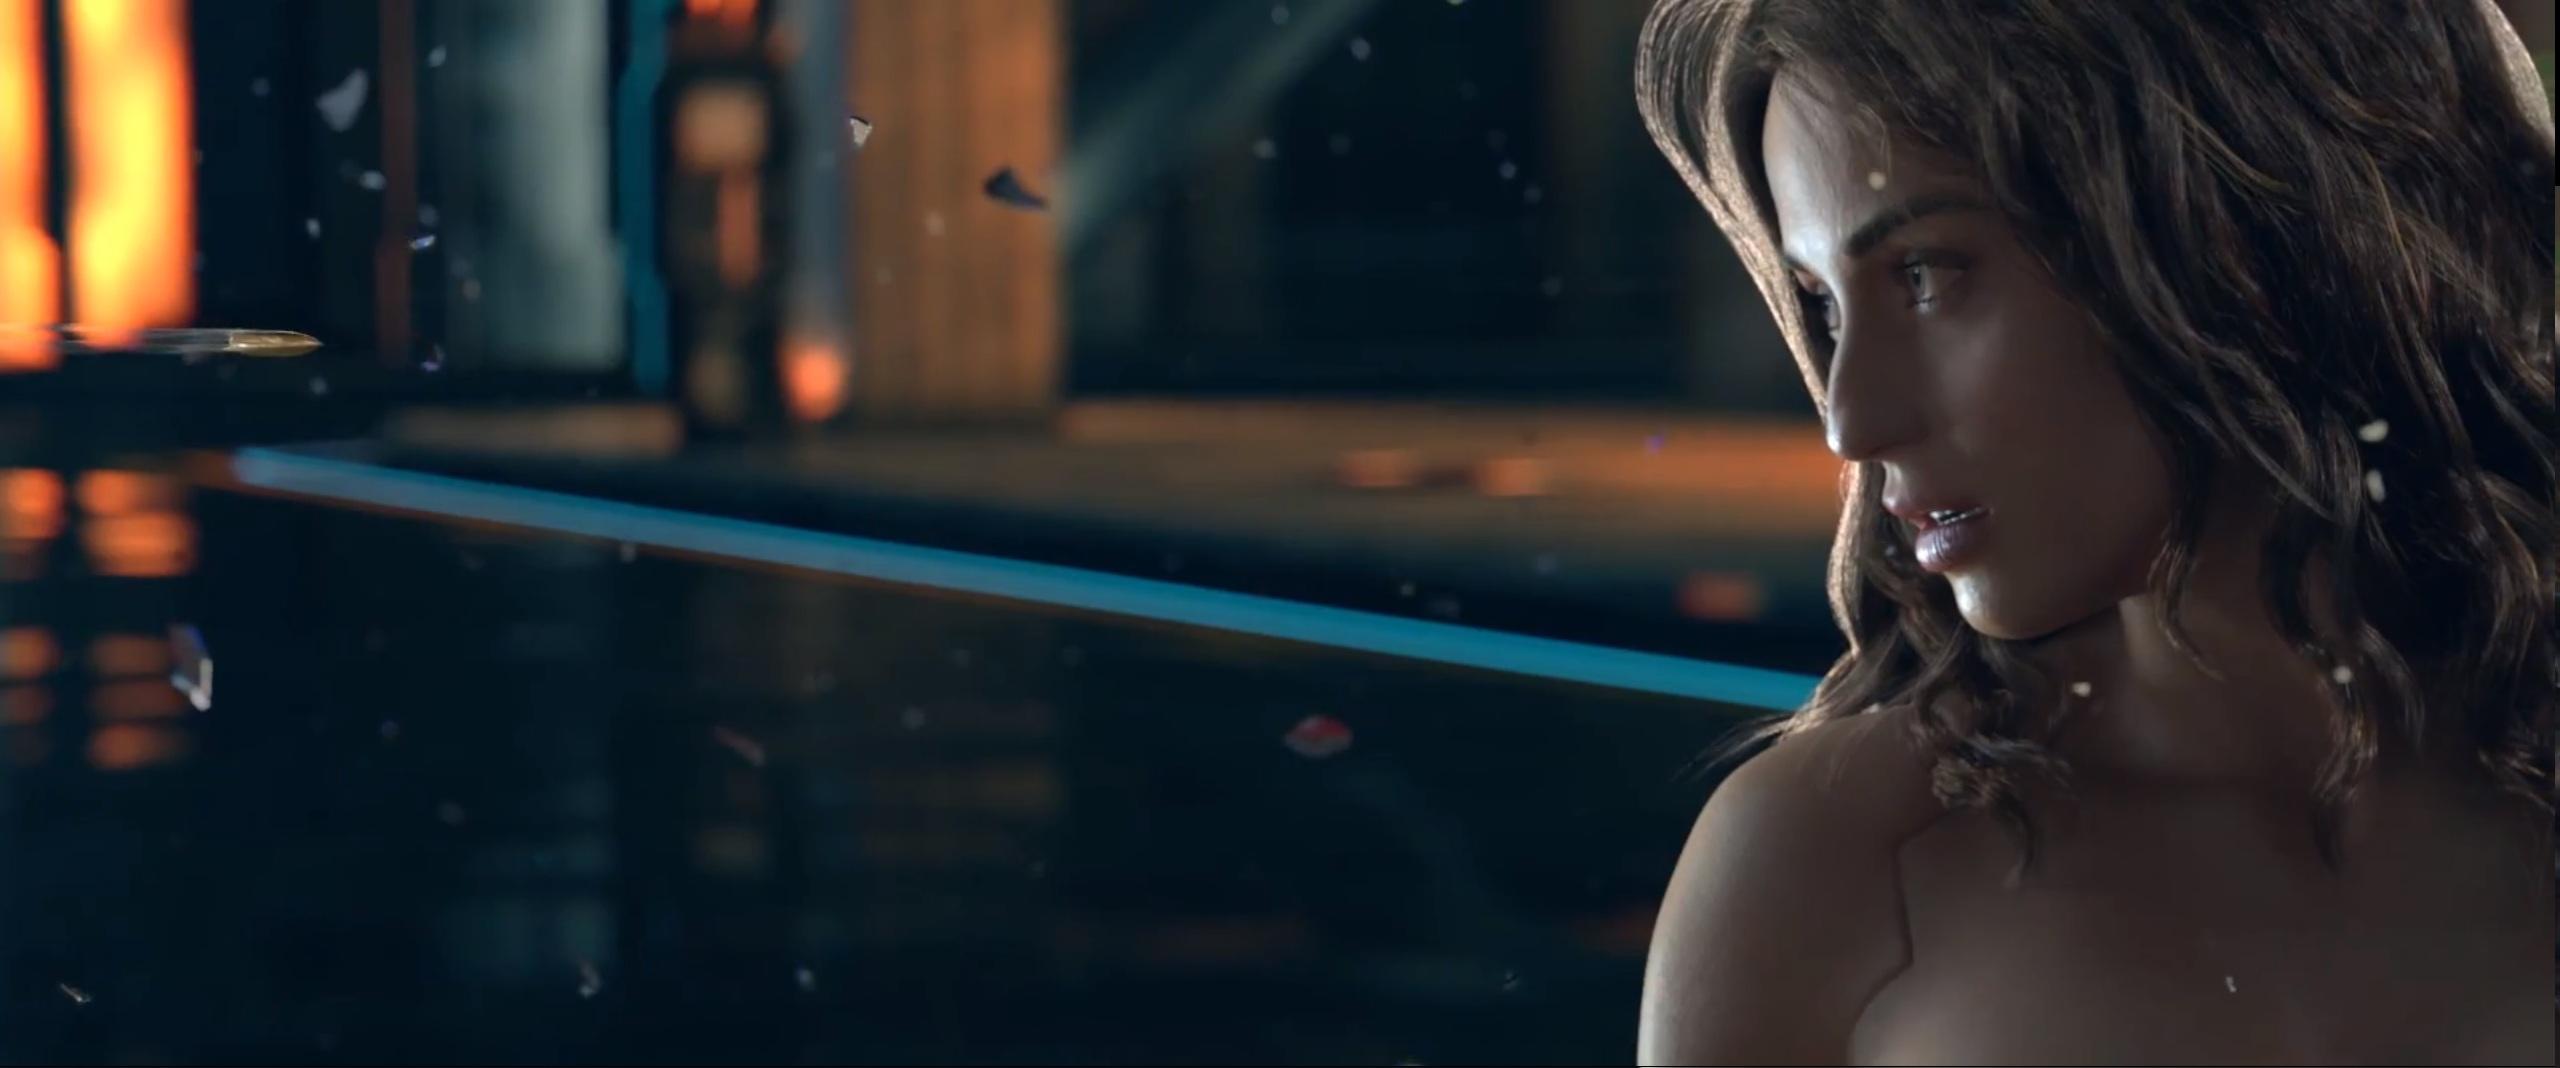 Girl Generation 2014 Wallpaper Cyberpunk 2077 Aims For Next Gen Consoles And Pcs